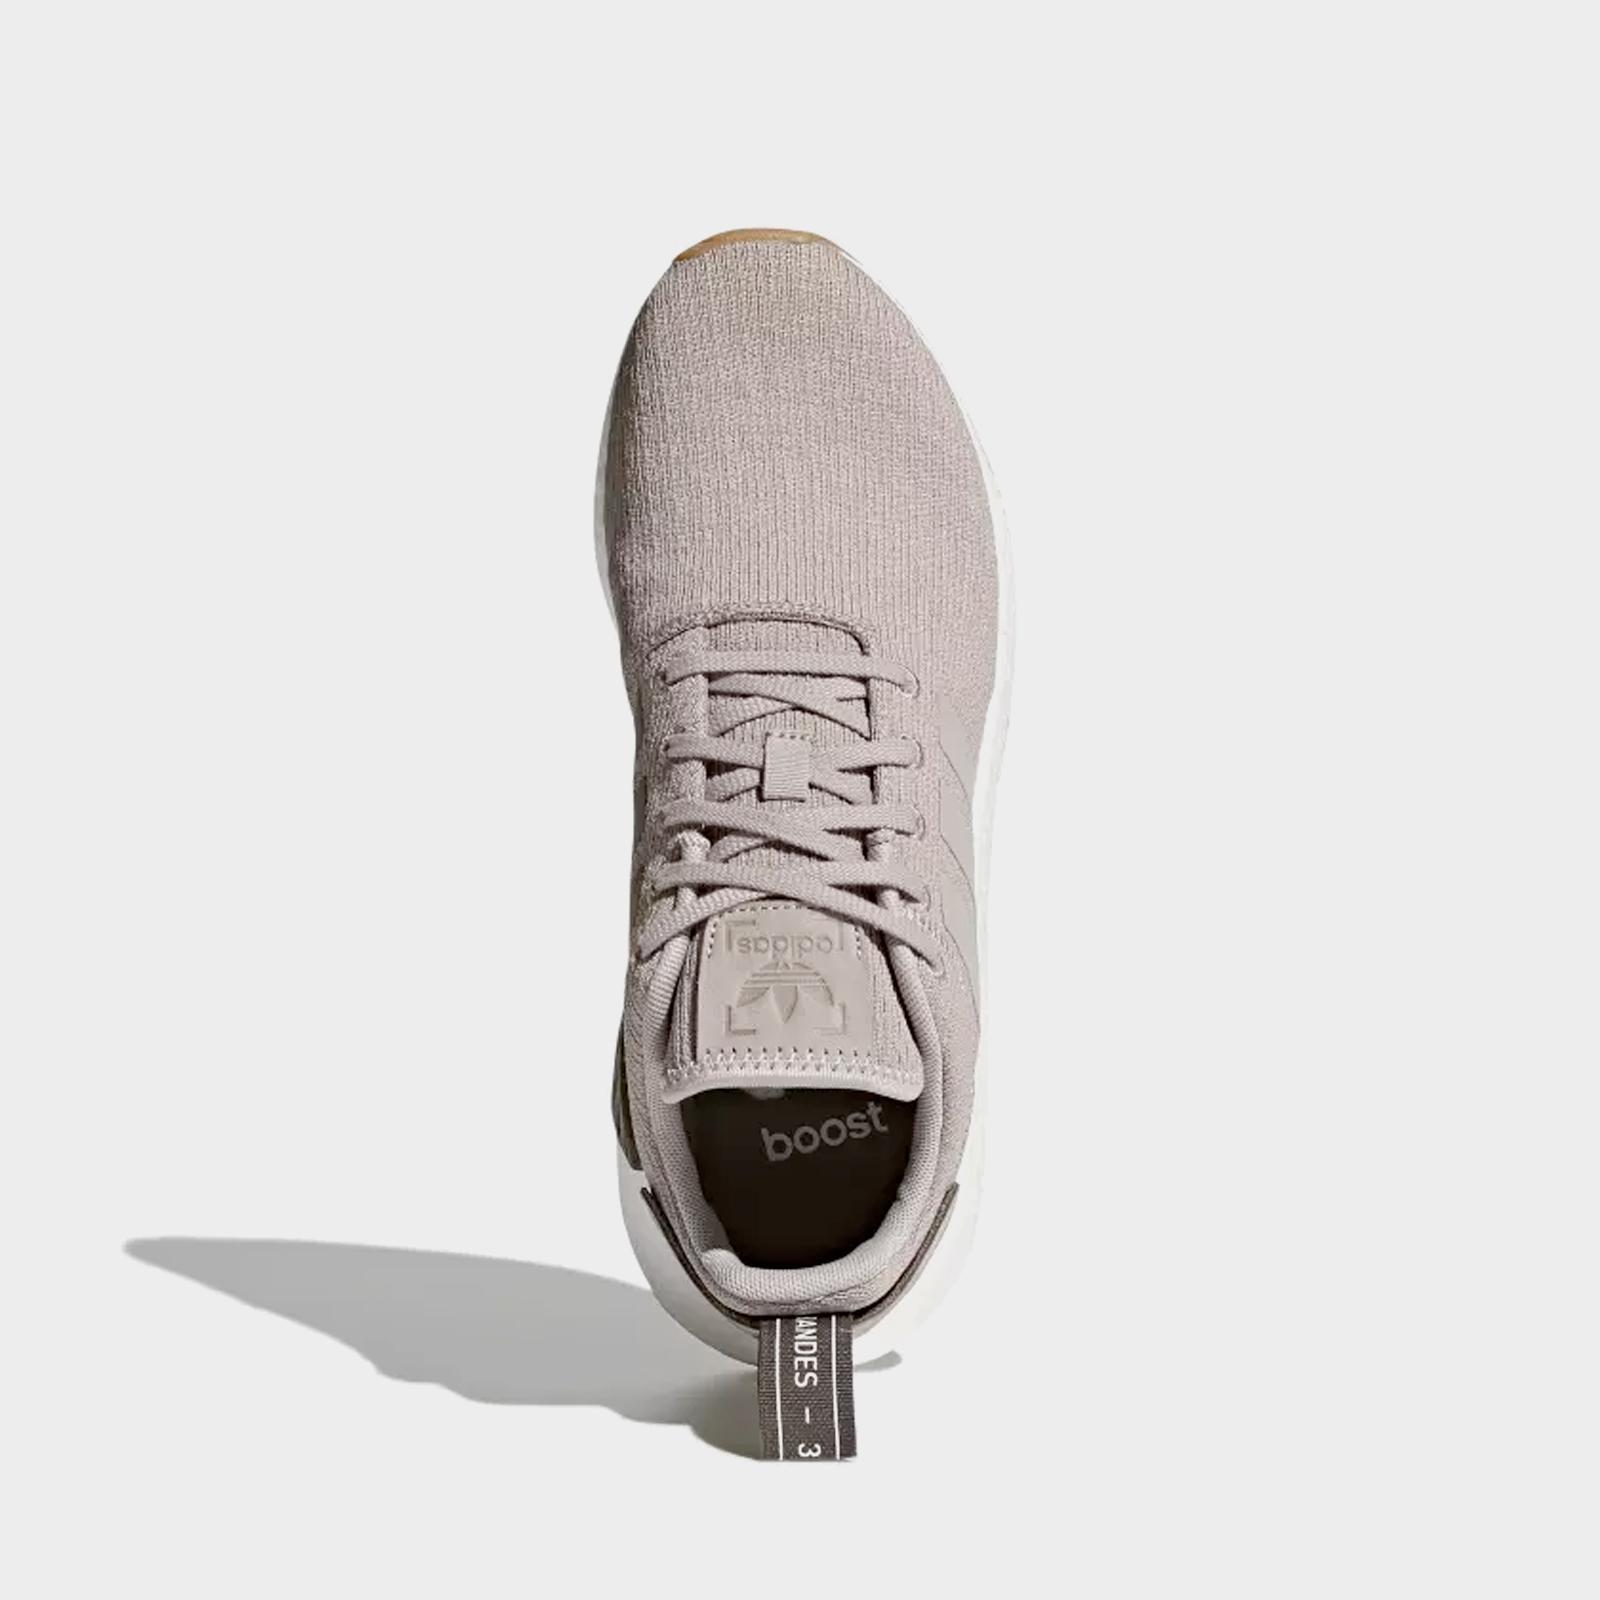 pretty nice d0dbb 389f6 adidas NMD R2 - Cq2399 - Sneakersnstuff | sneakers ...